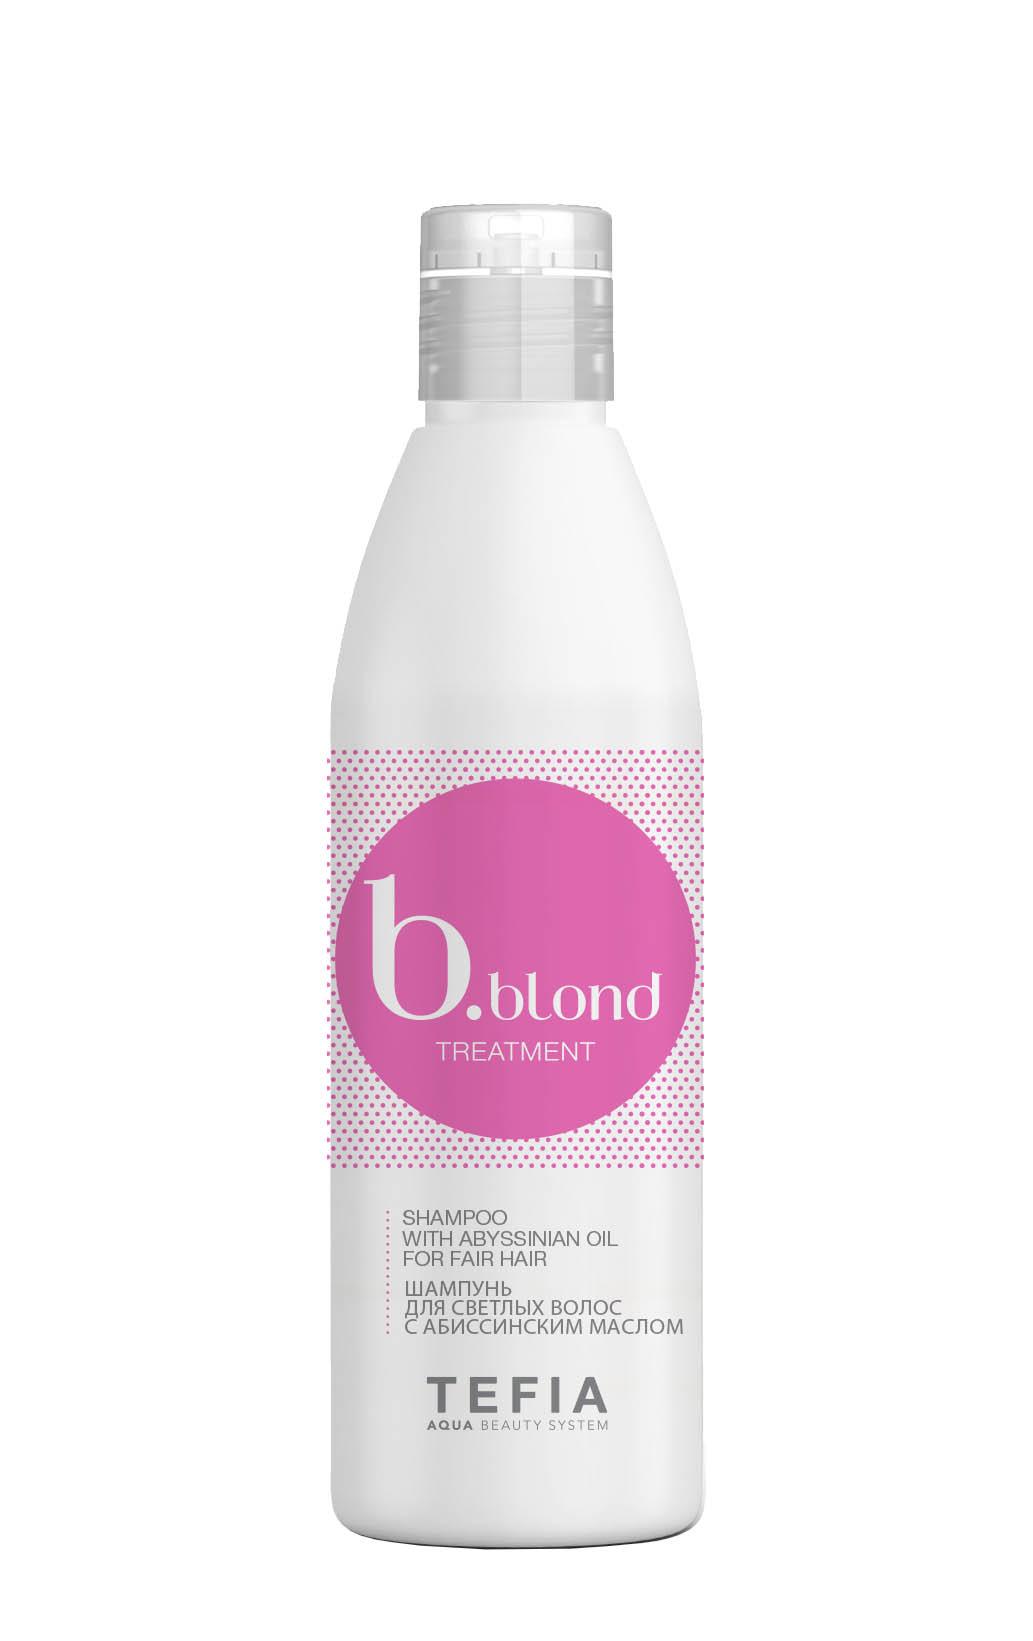 TEFIA Шампунь для светлых волос с абиссинским маслом / Bblond Treatment 250 мл фото